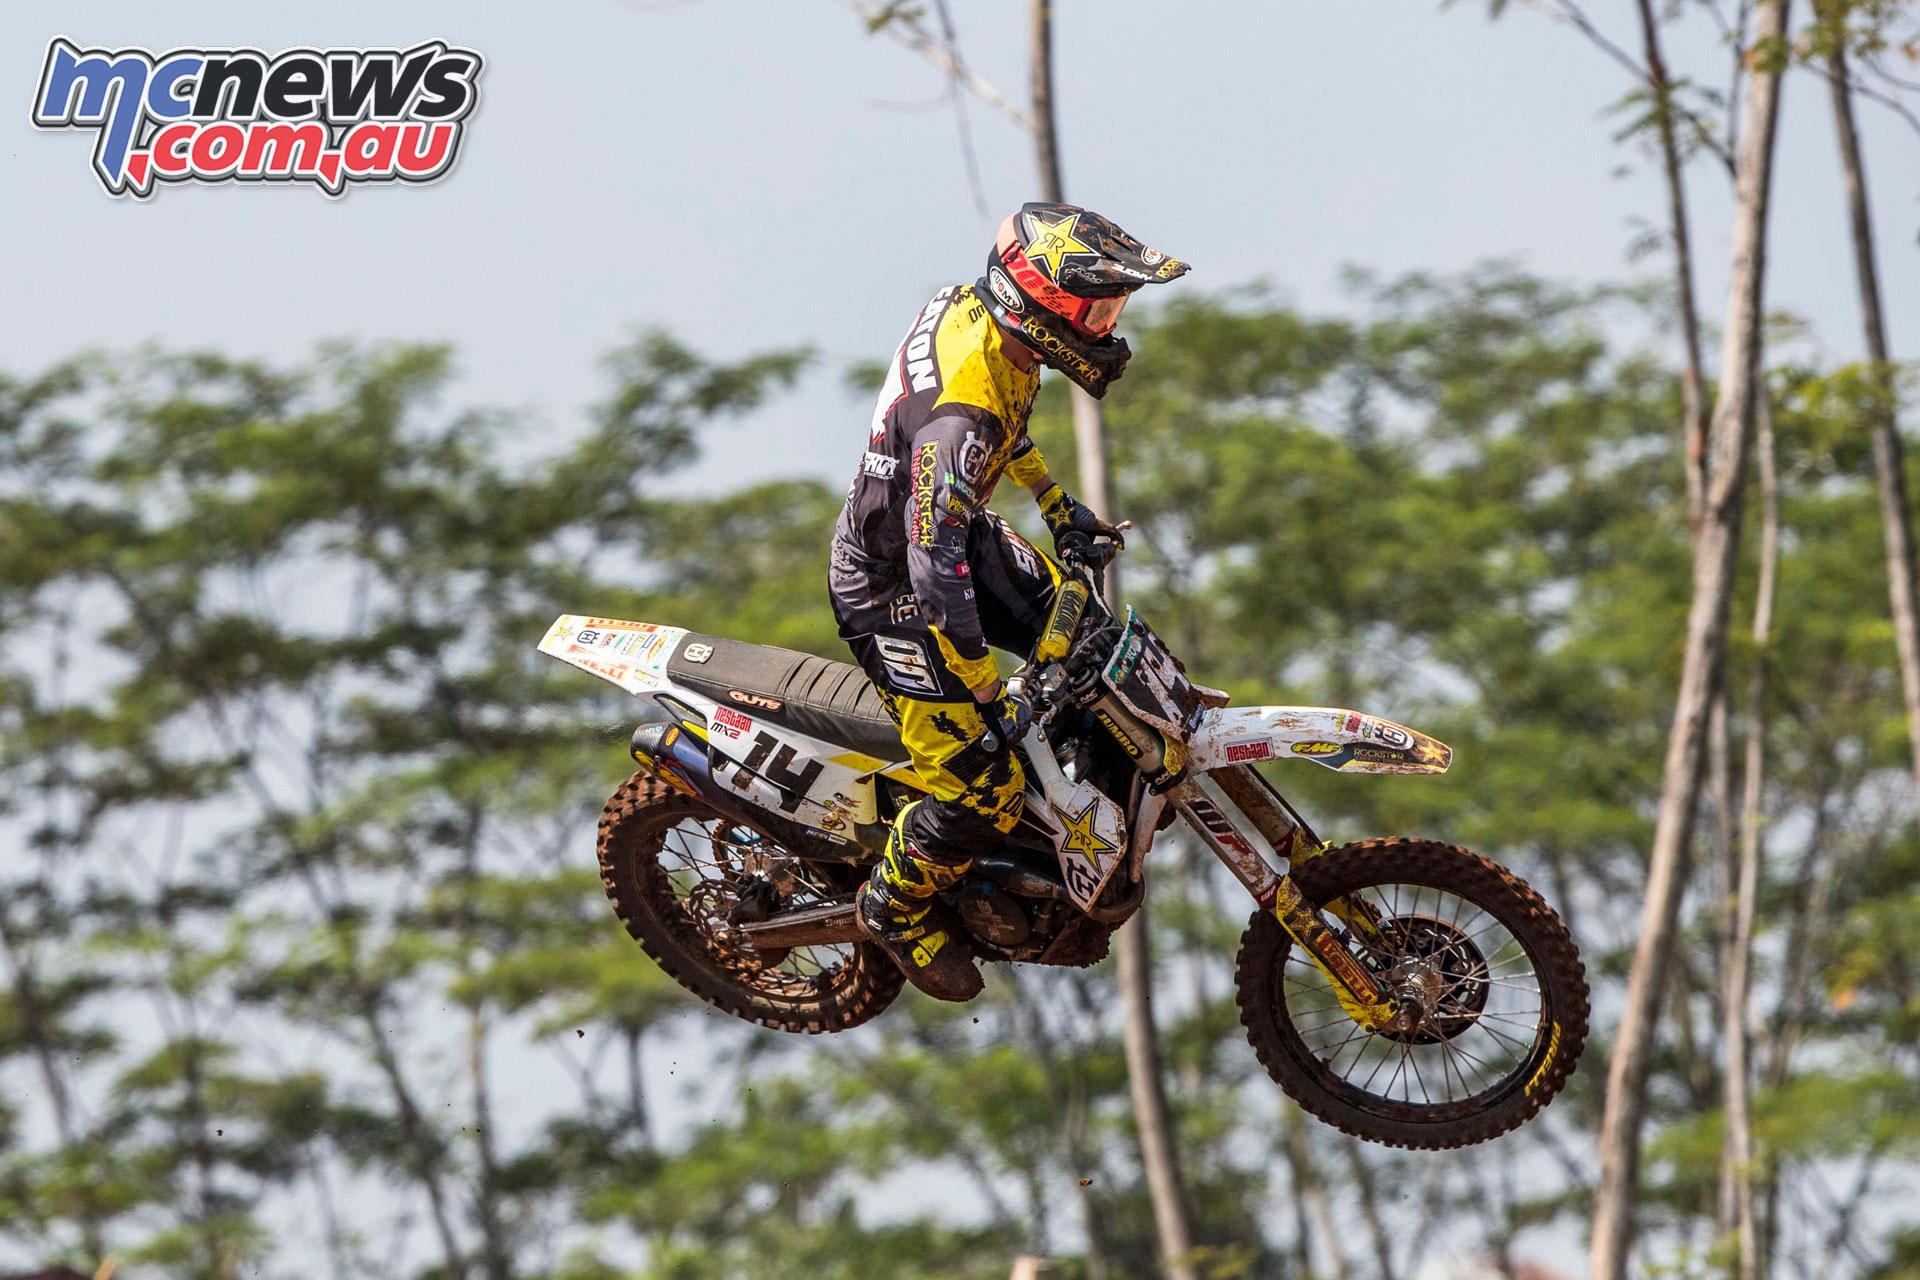 MXGP Asia Semarang Rnd Jed Beaton